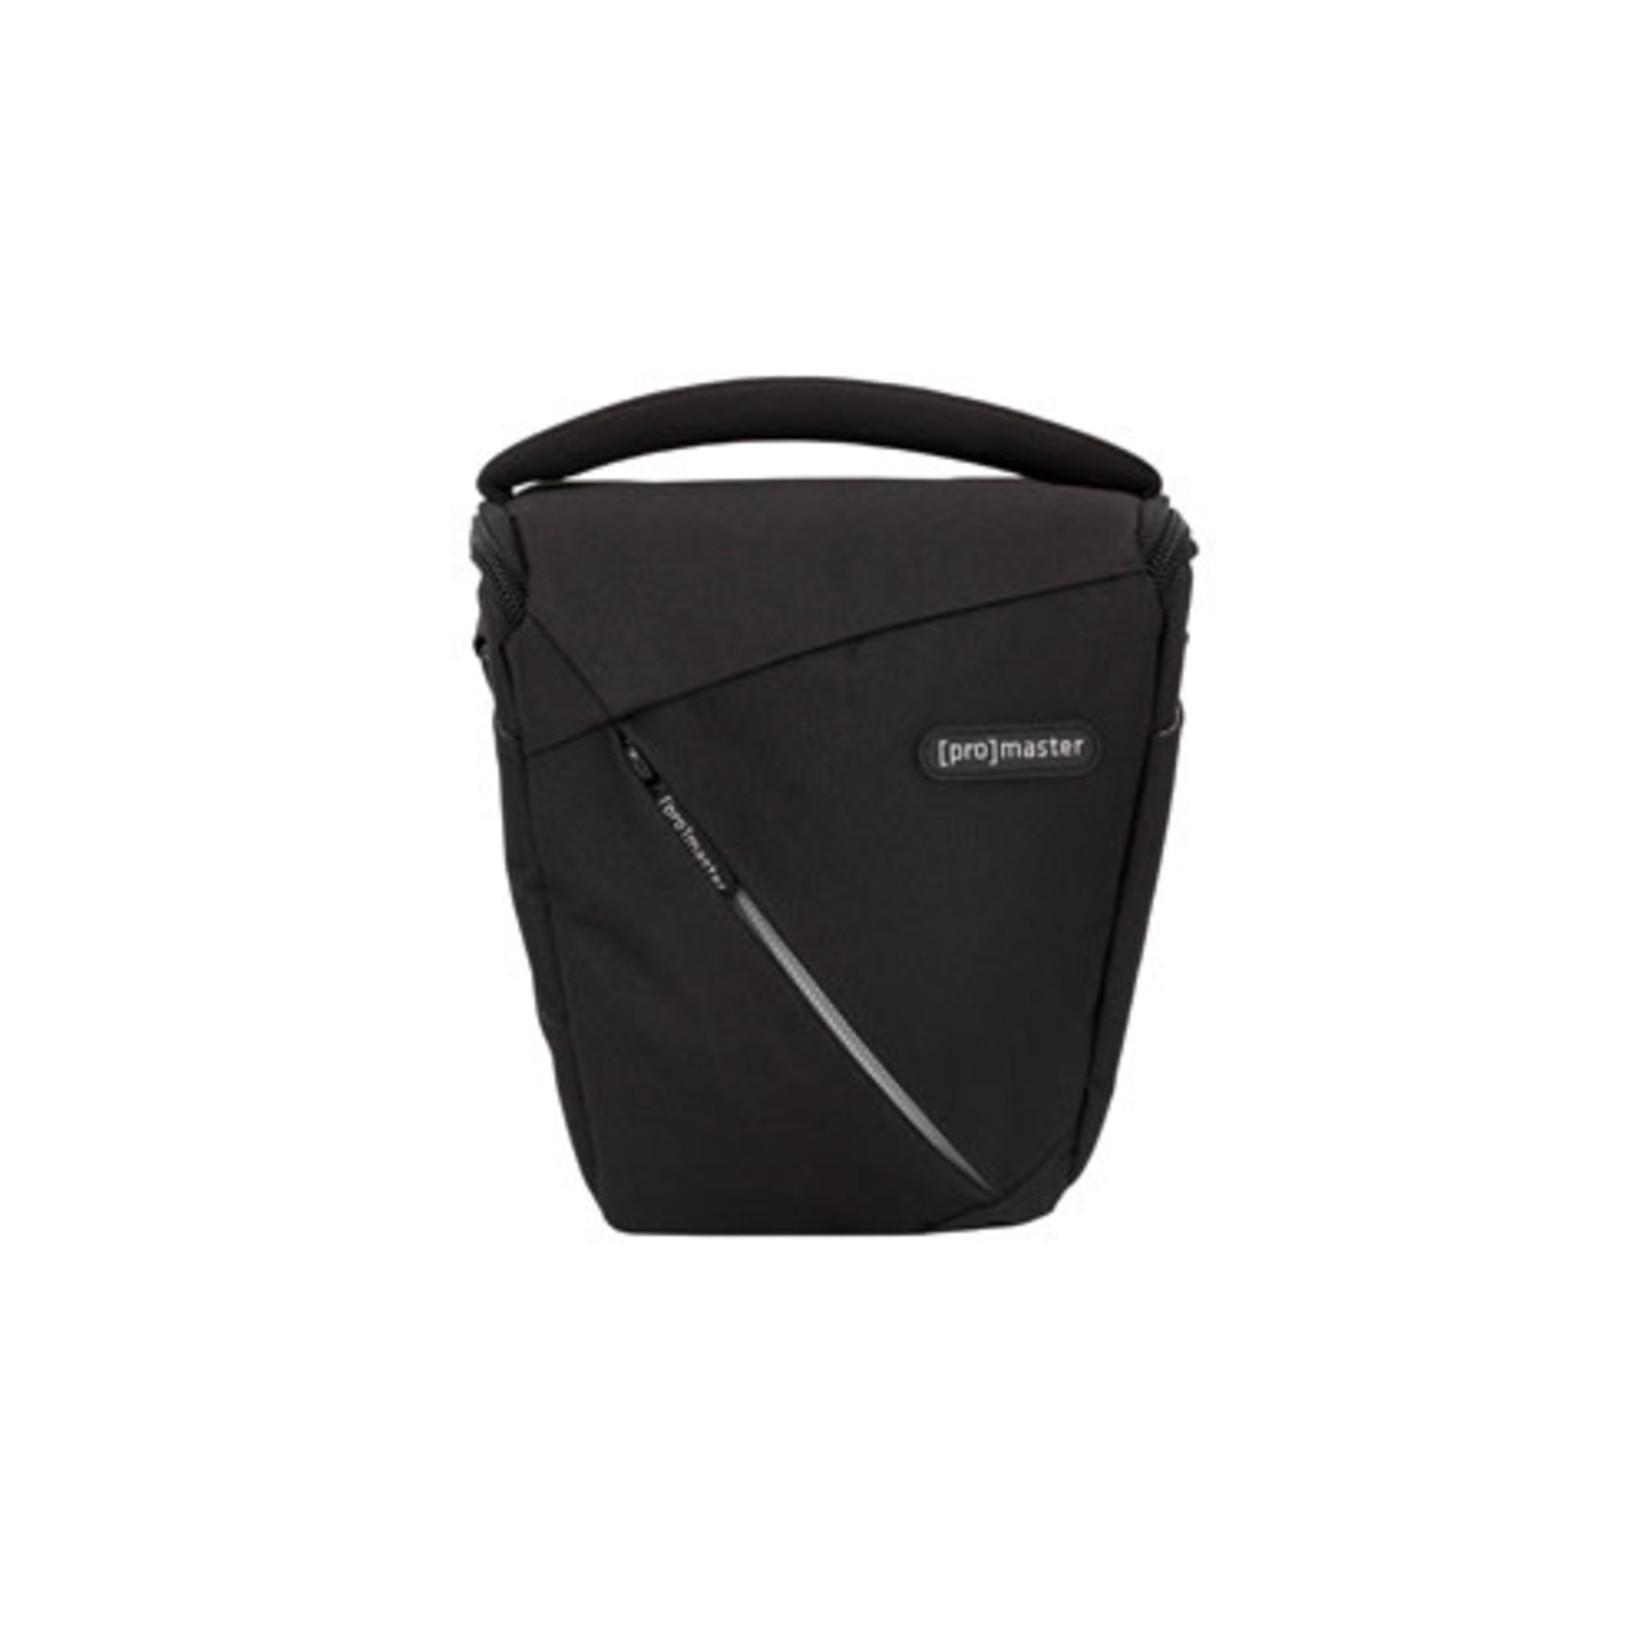 ProMaster Impulse Large Holster Bag - Black